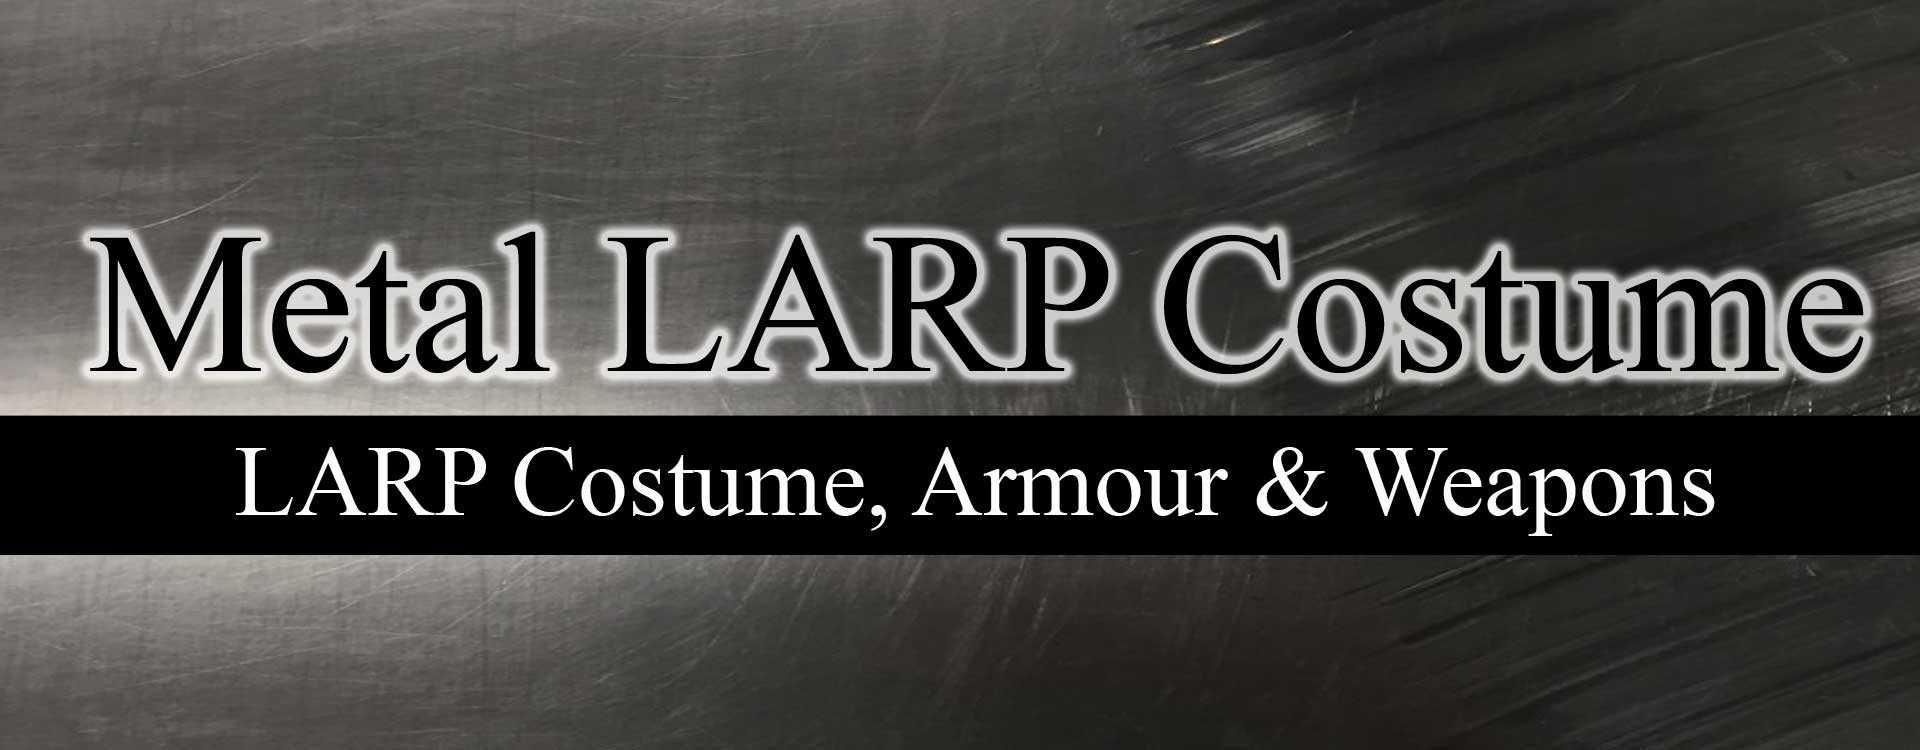 Metal LARP Costume Maintenance, Storage & Repairs